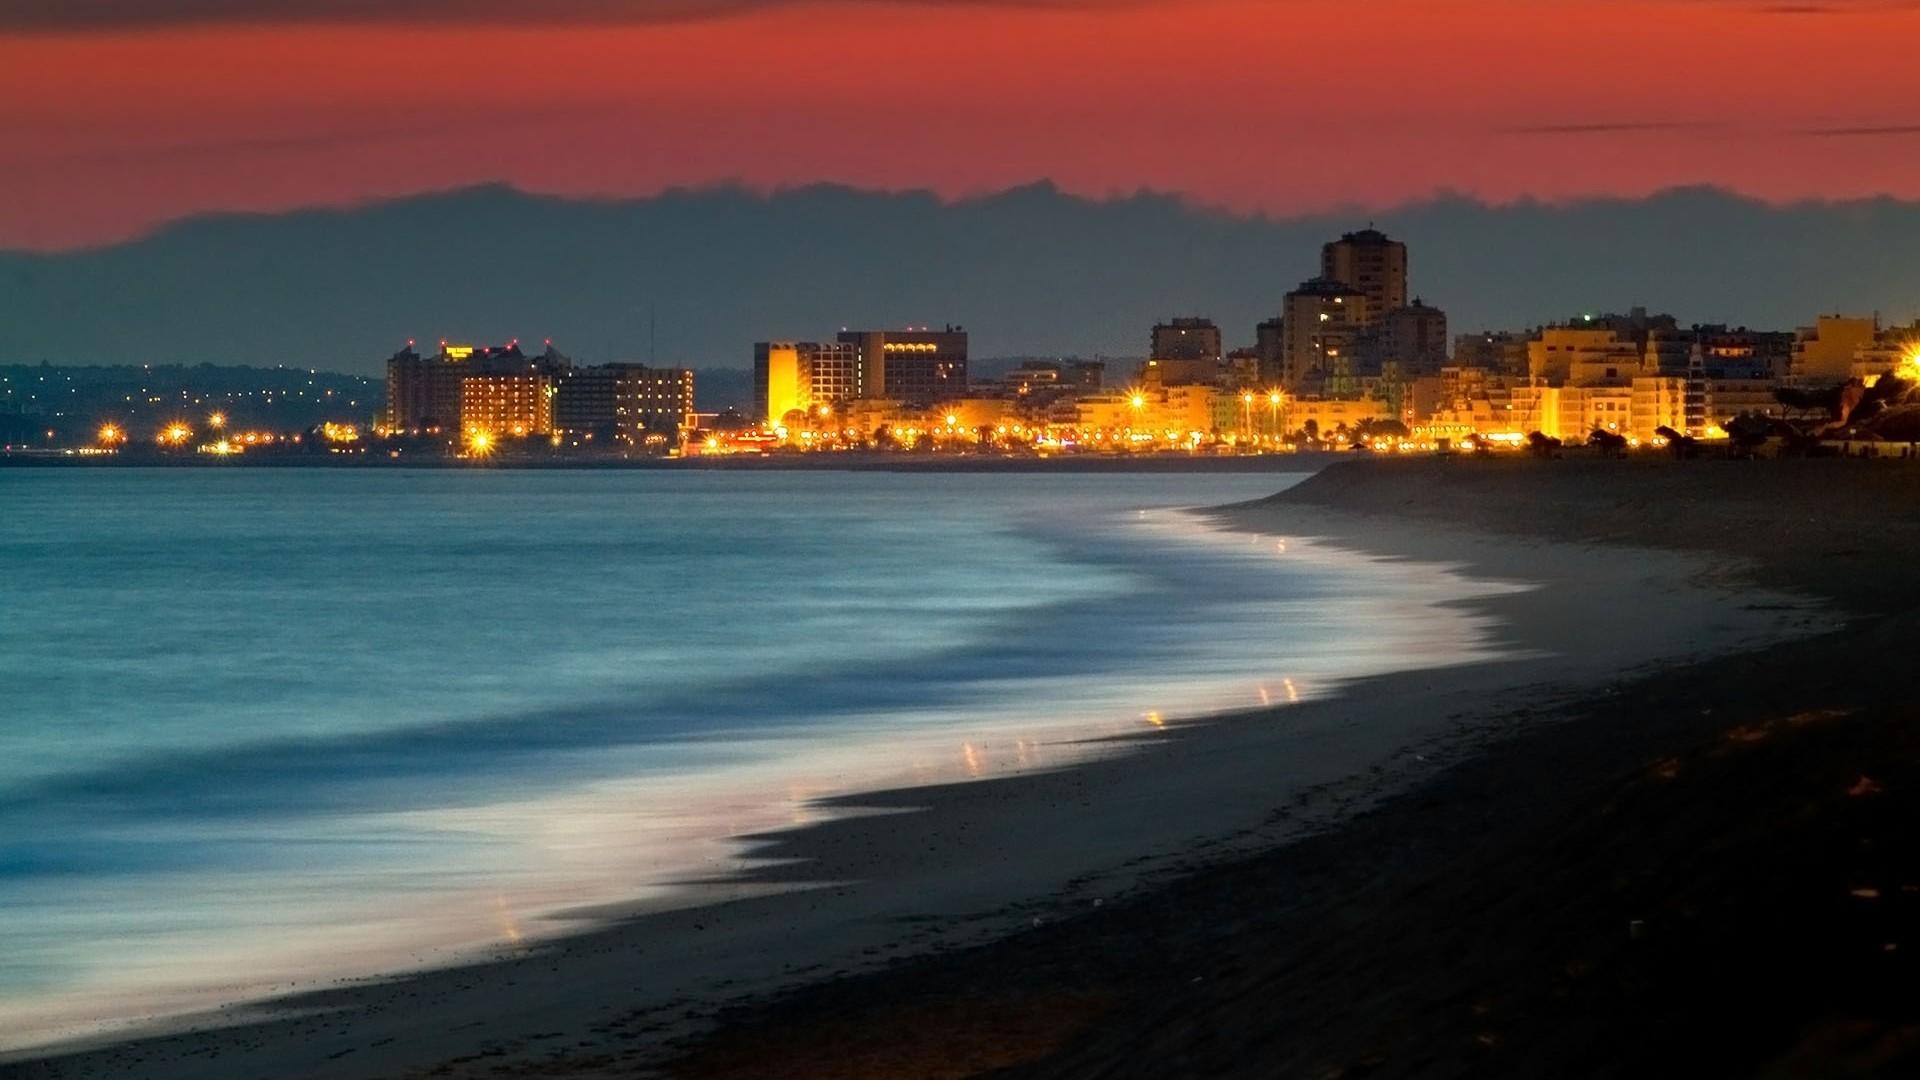 Wallpaper kusadasi, turkey, beach, night, building, light, ocean